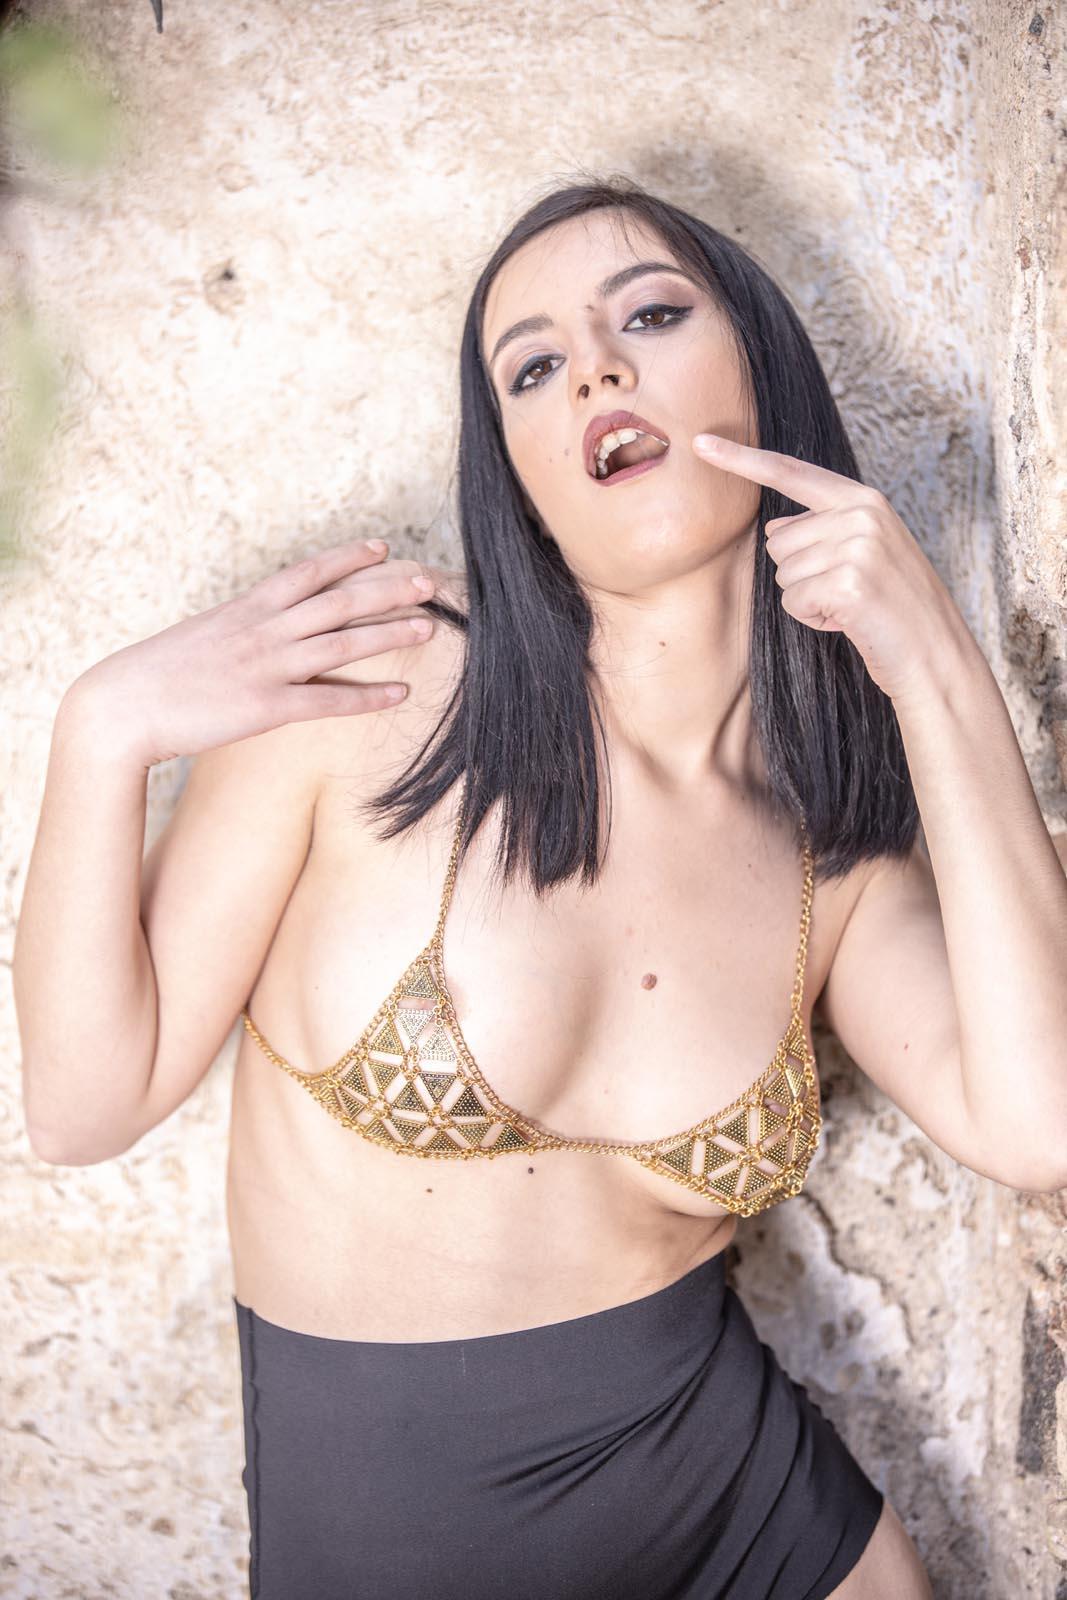 Marica_nudeart_Messina4